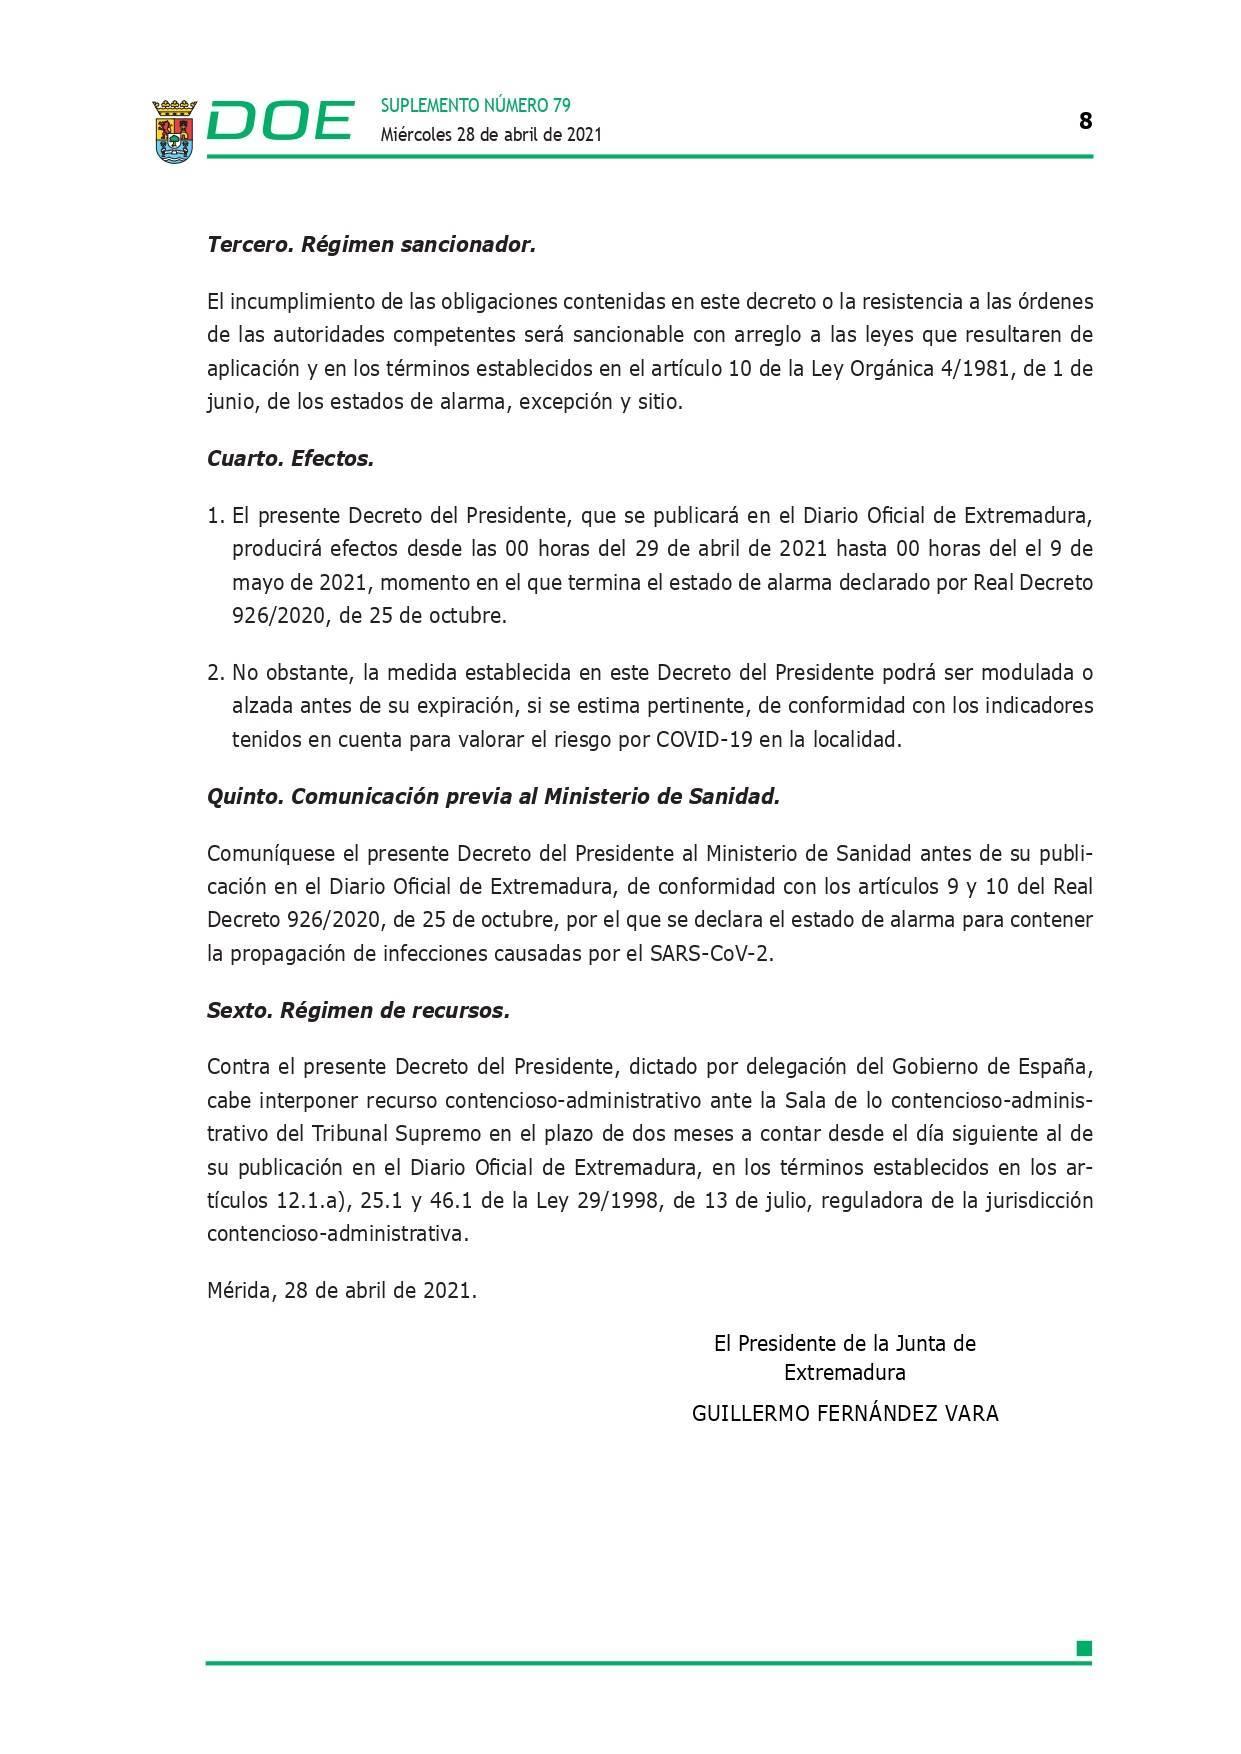 Cierre perimetral por COVID-19 (abril 2021) - Guadalupe (Cáceres) 8